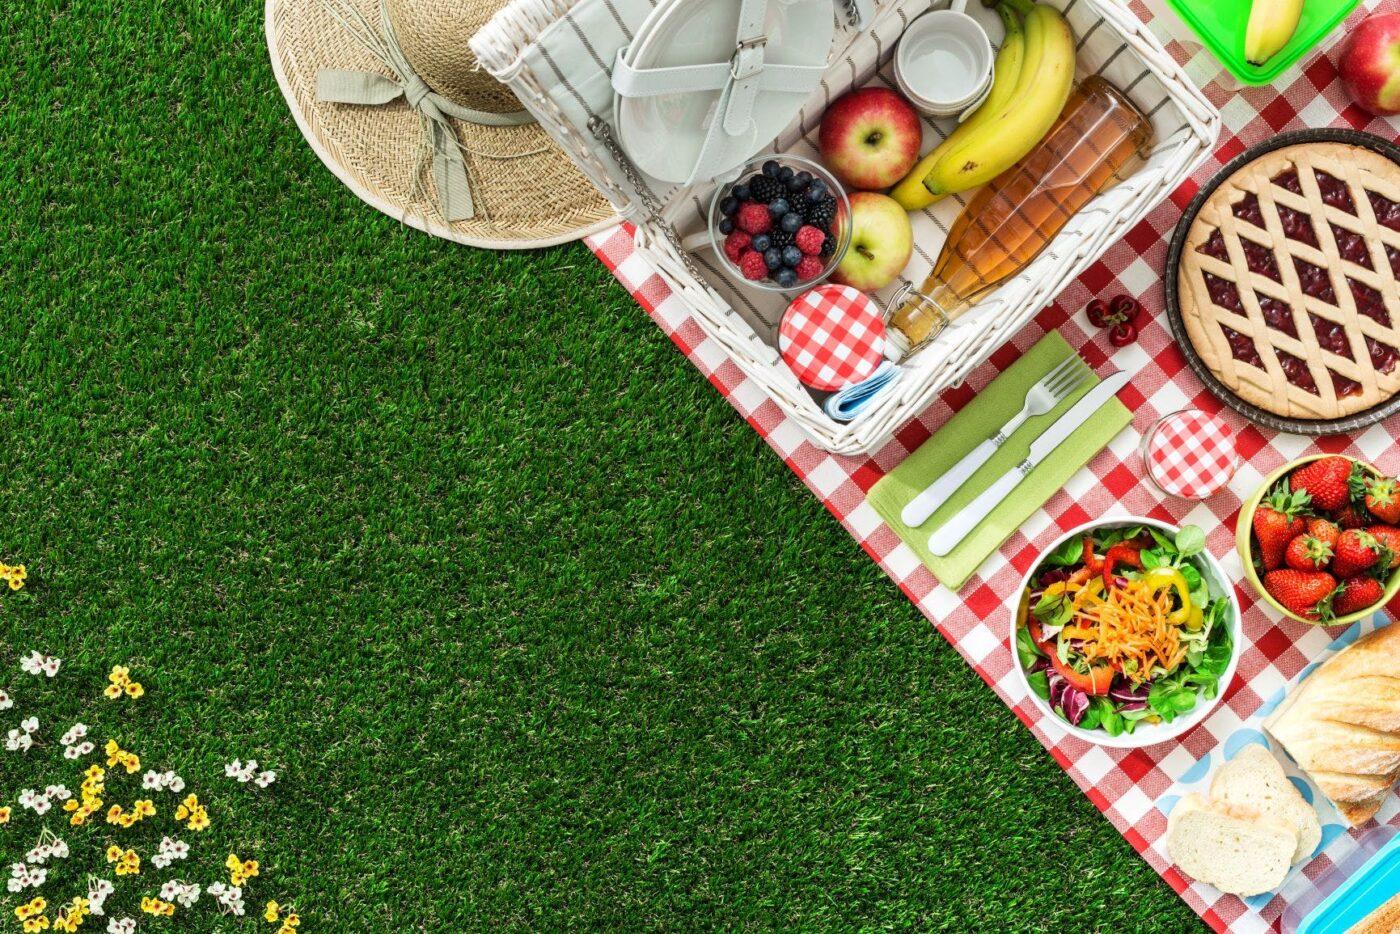 Go for a picnic!